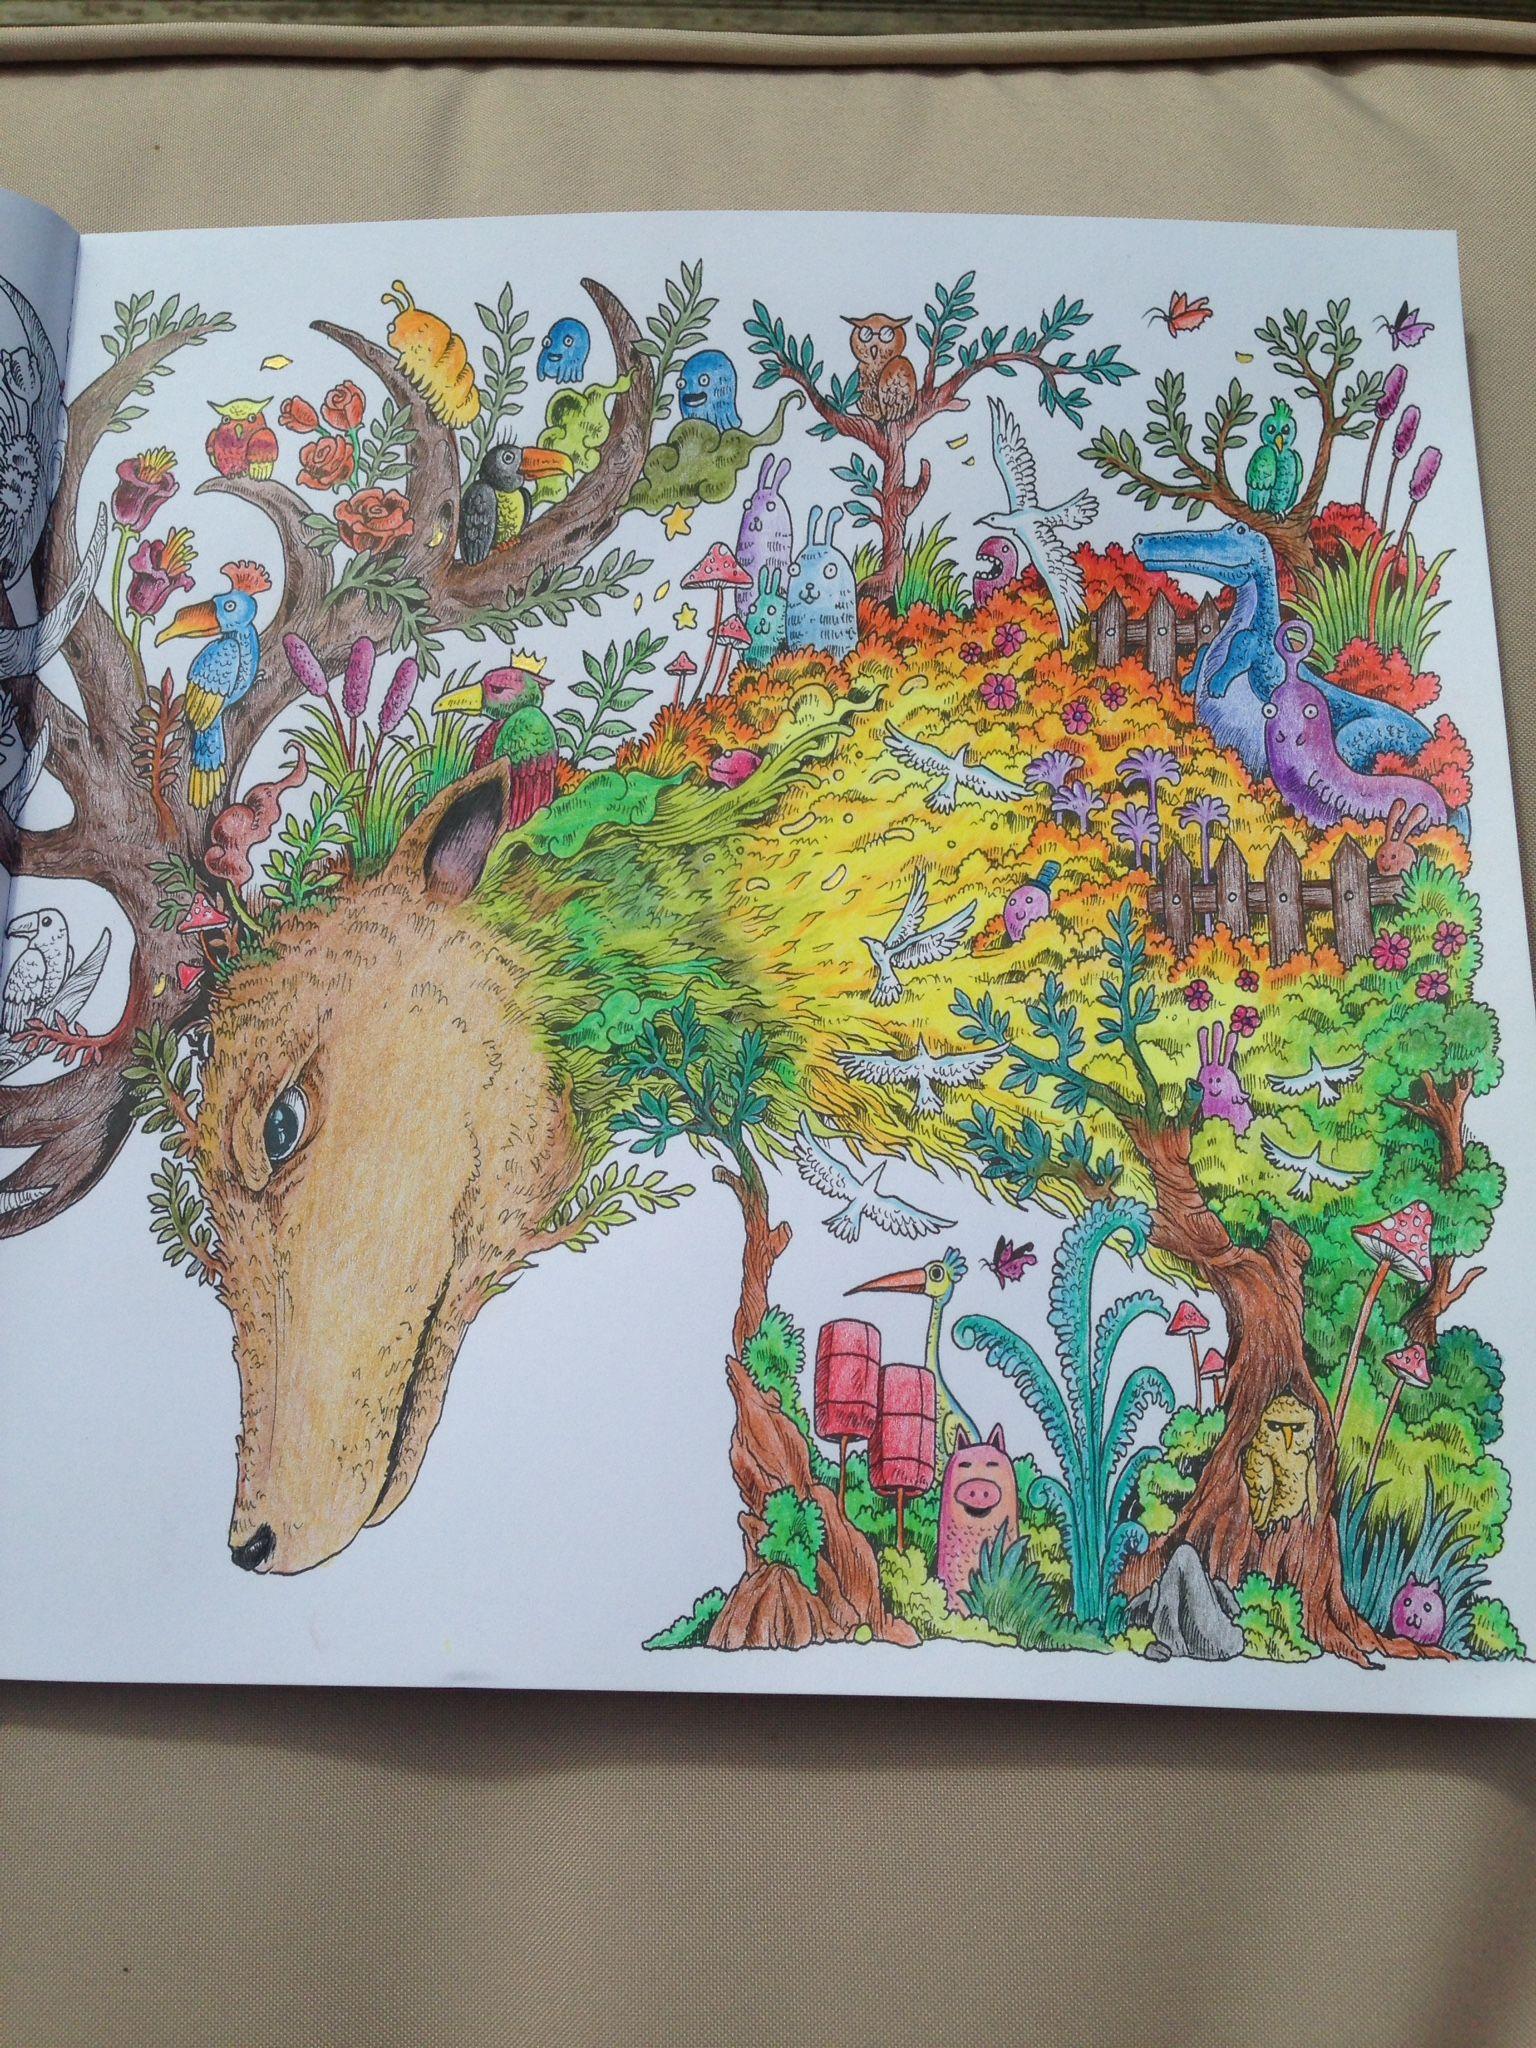 Dear Of Animorphia Colour ColourDoodle ArtColouringAdult ColoringColoring BooksFarveColored Pencil TutorialWatercoloursColored Pencils